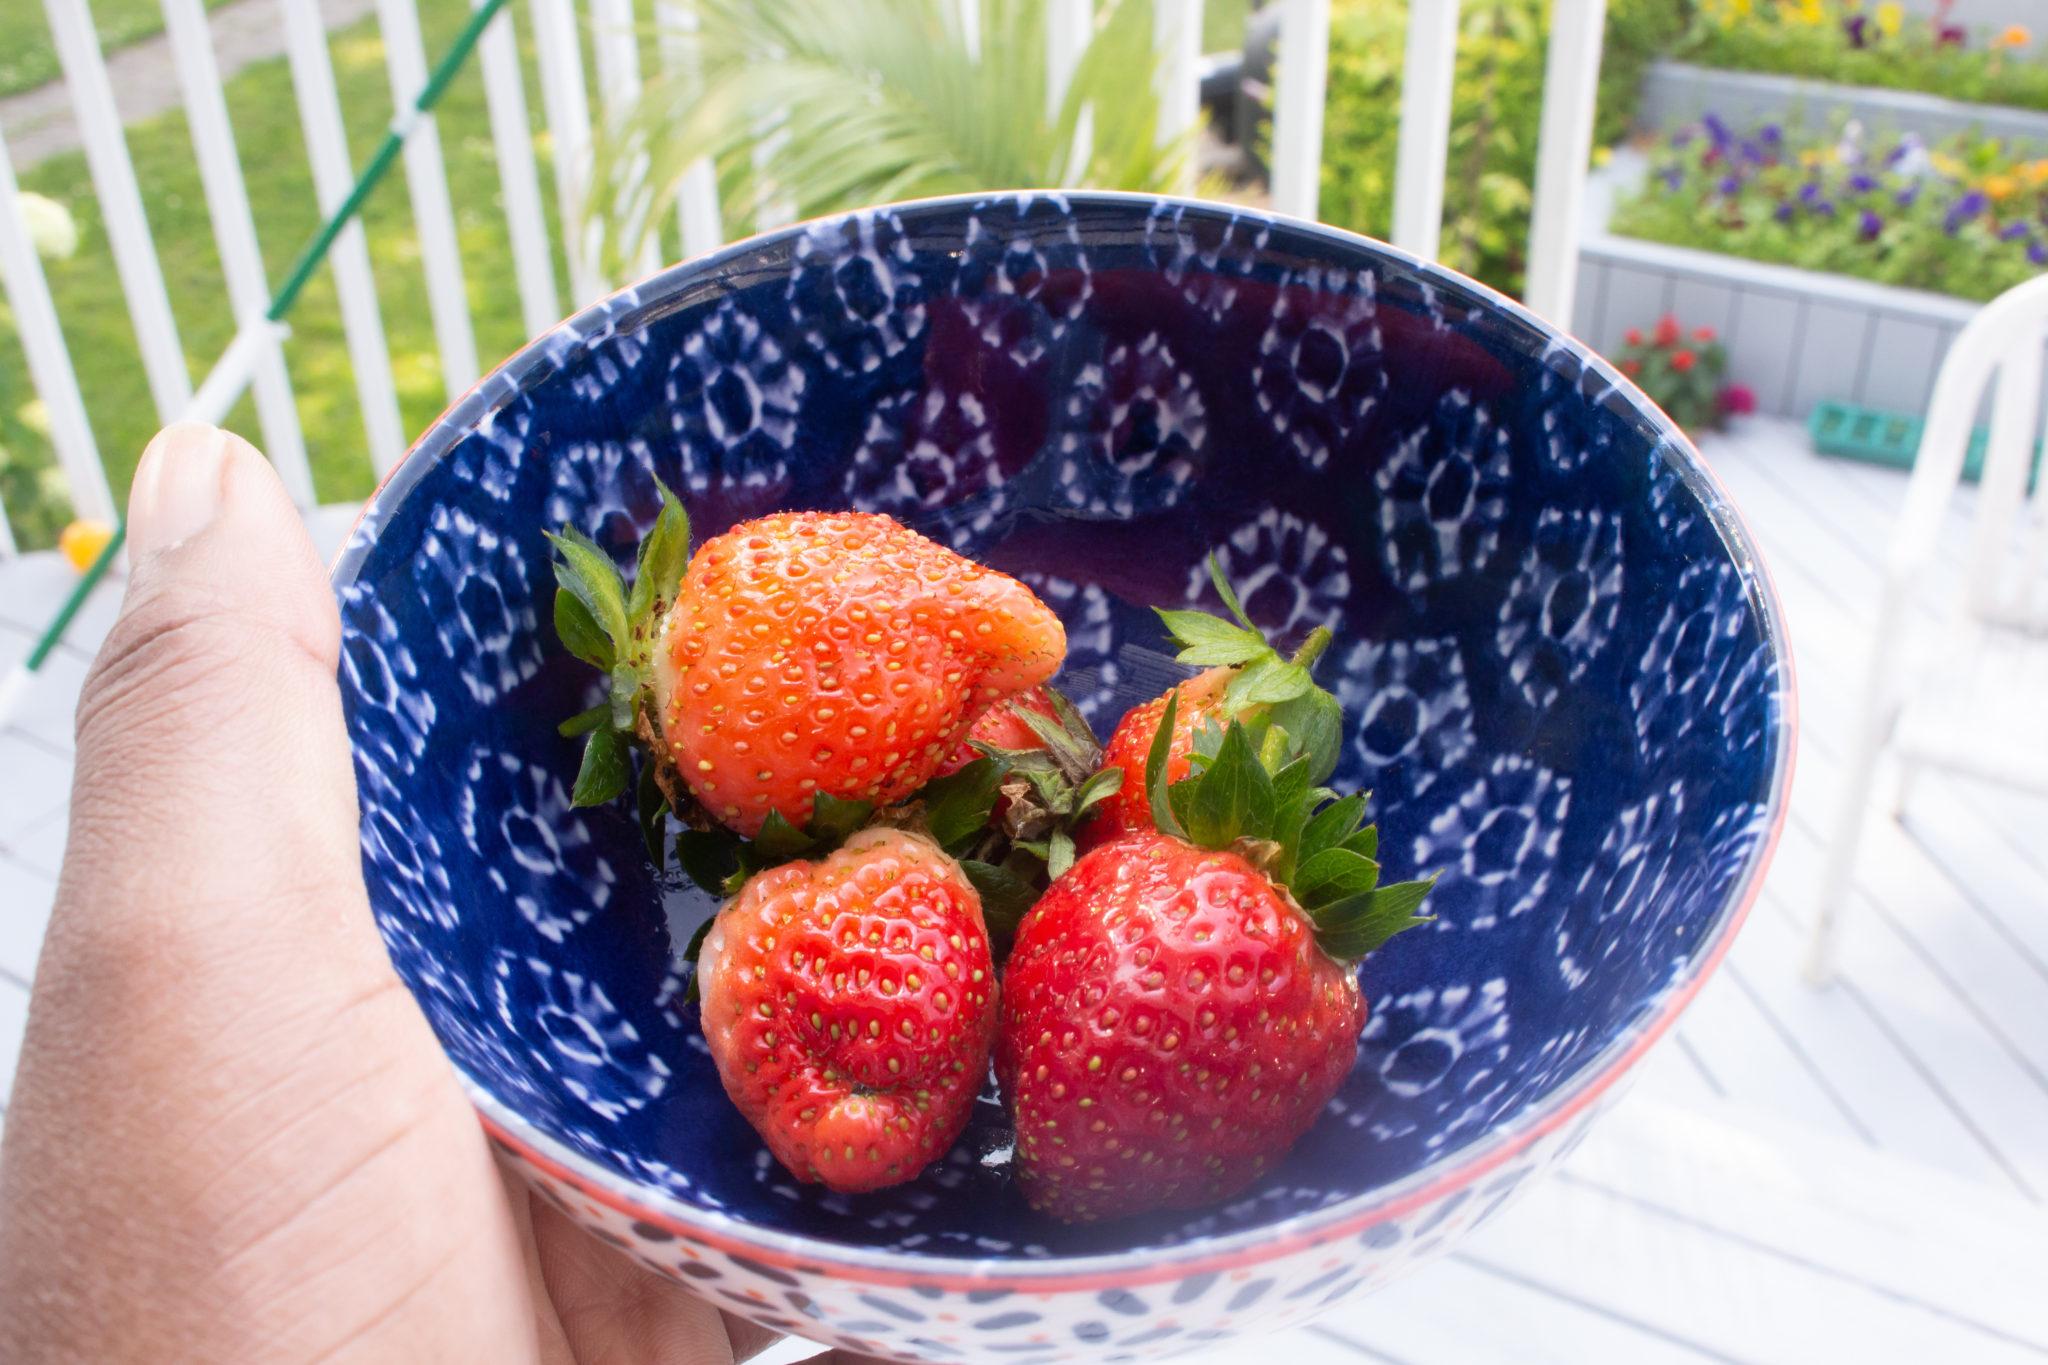 Garden Update: Strawberry picking in our own yard!